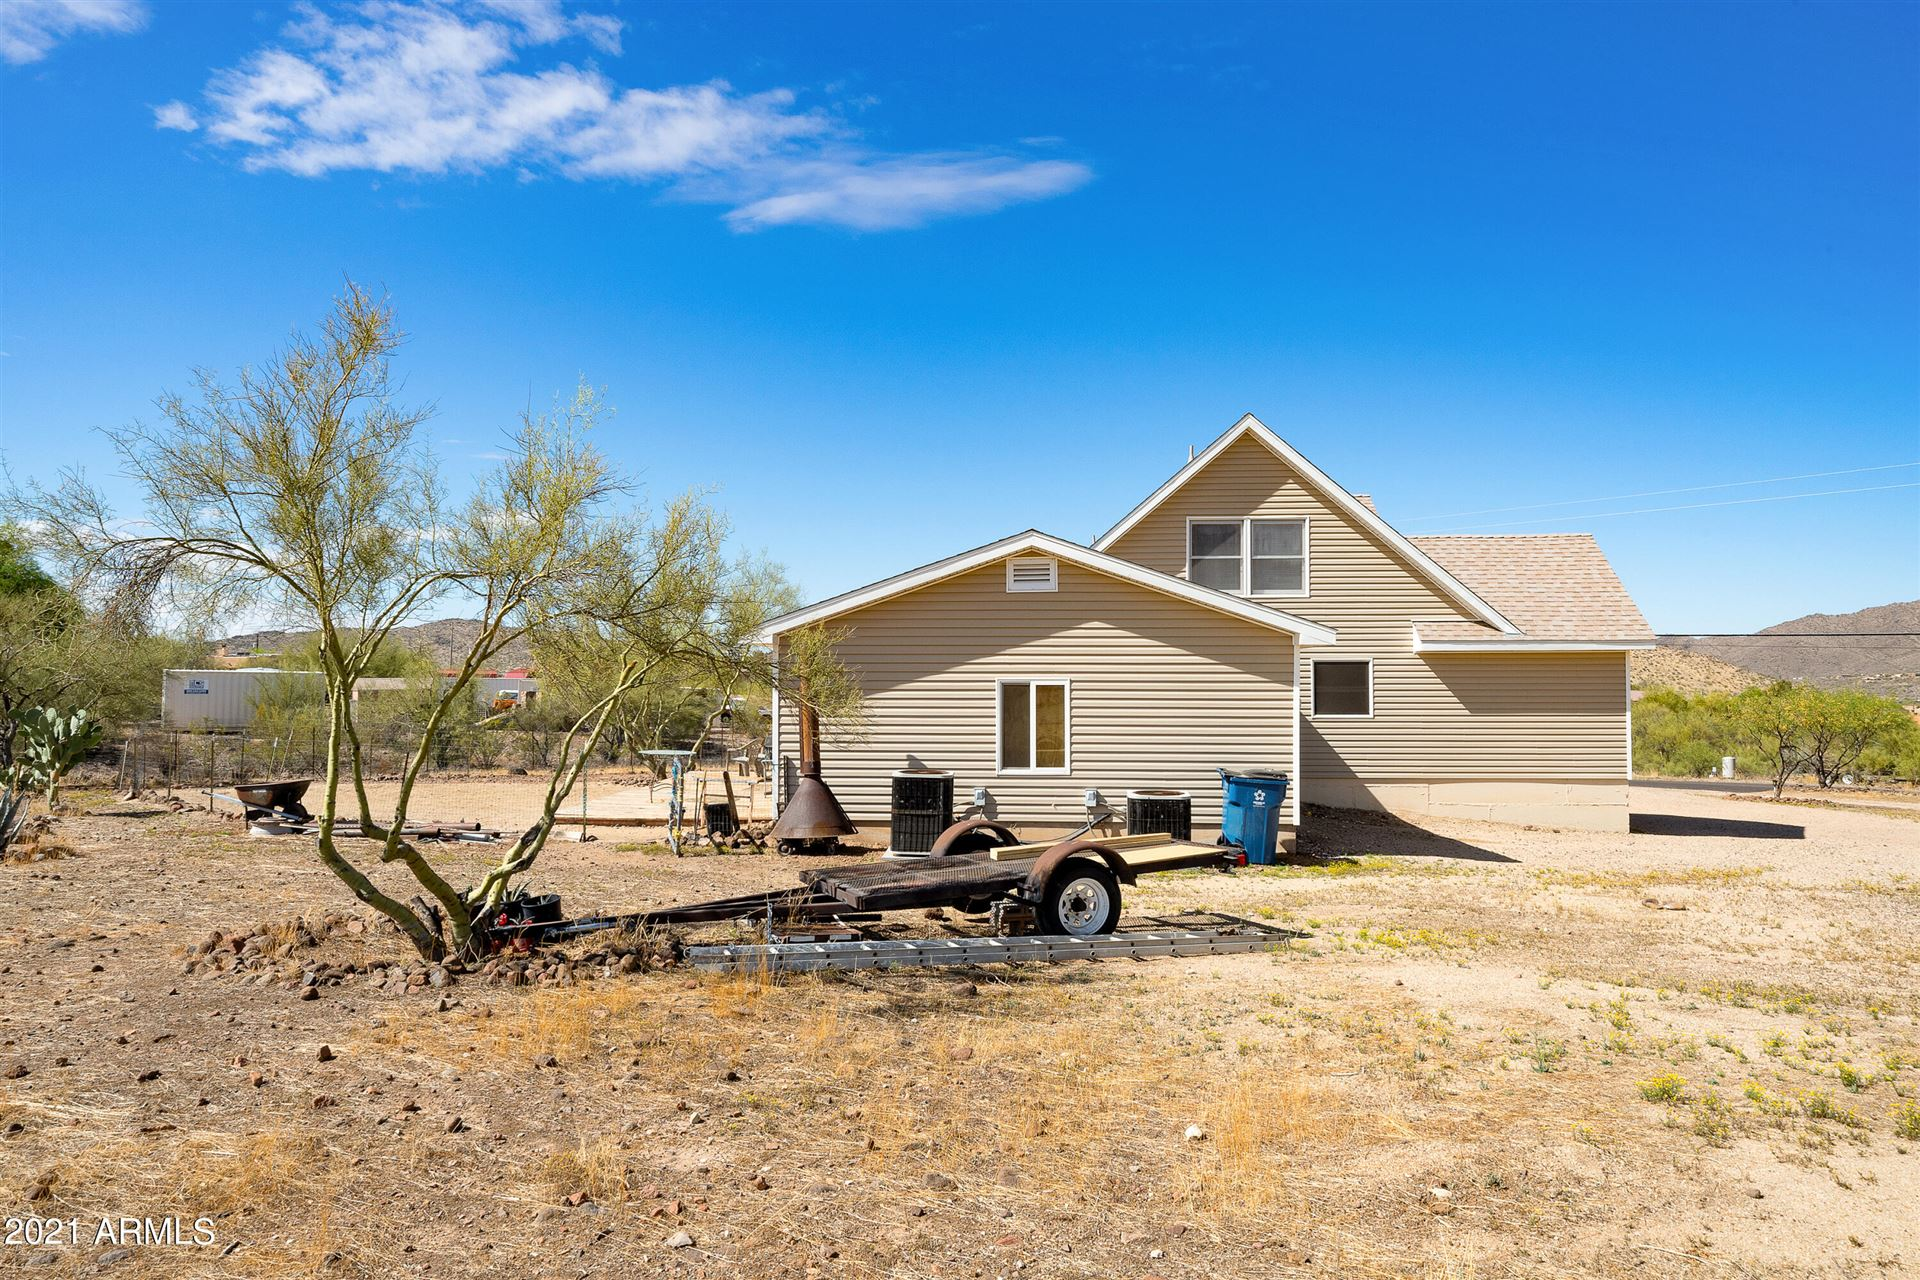 Photo of 44835 N 14TH Street, New River, AZ 85087 (MLS # 6227846)